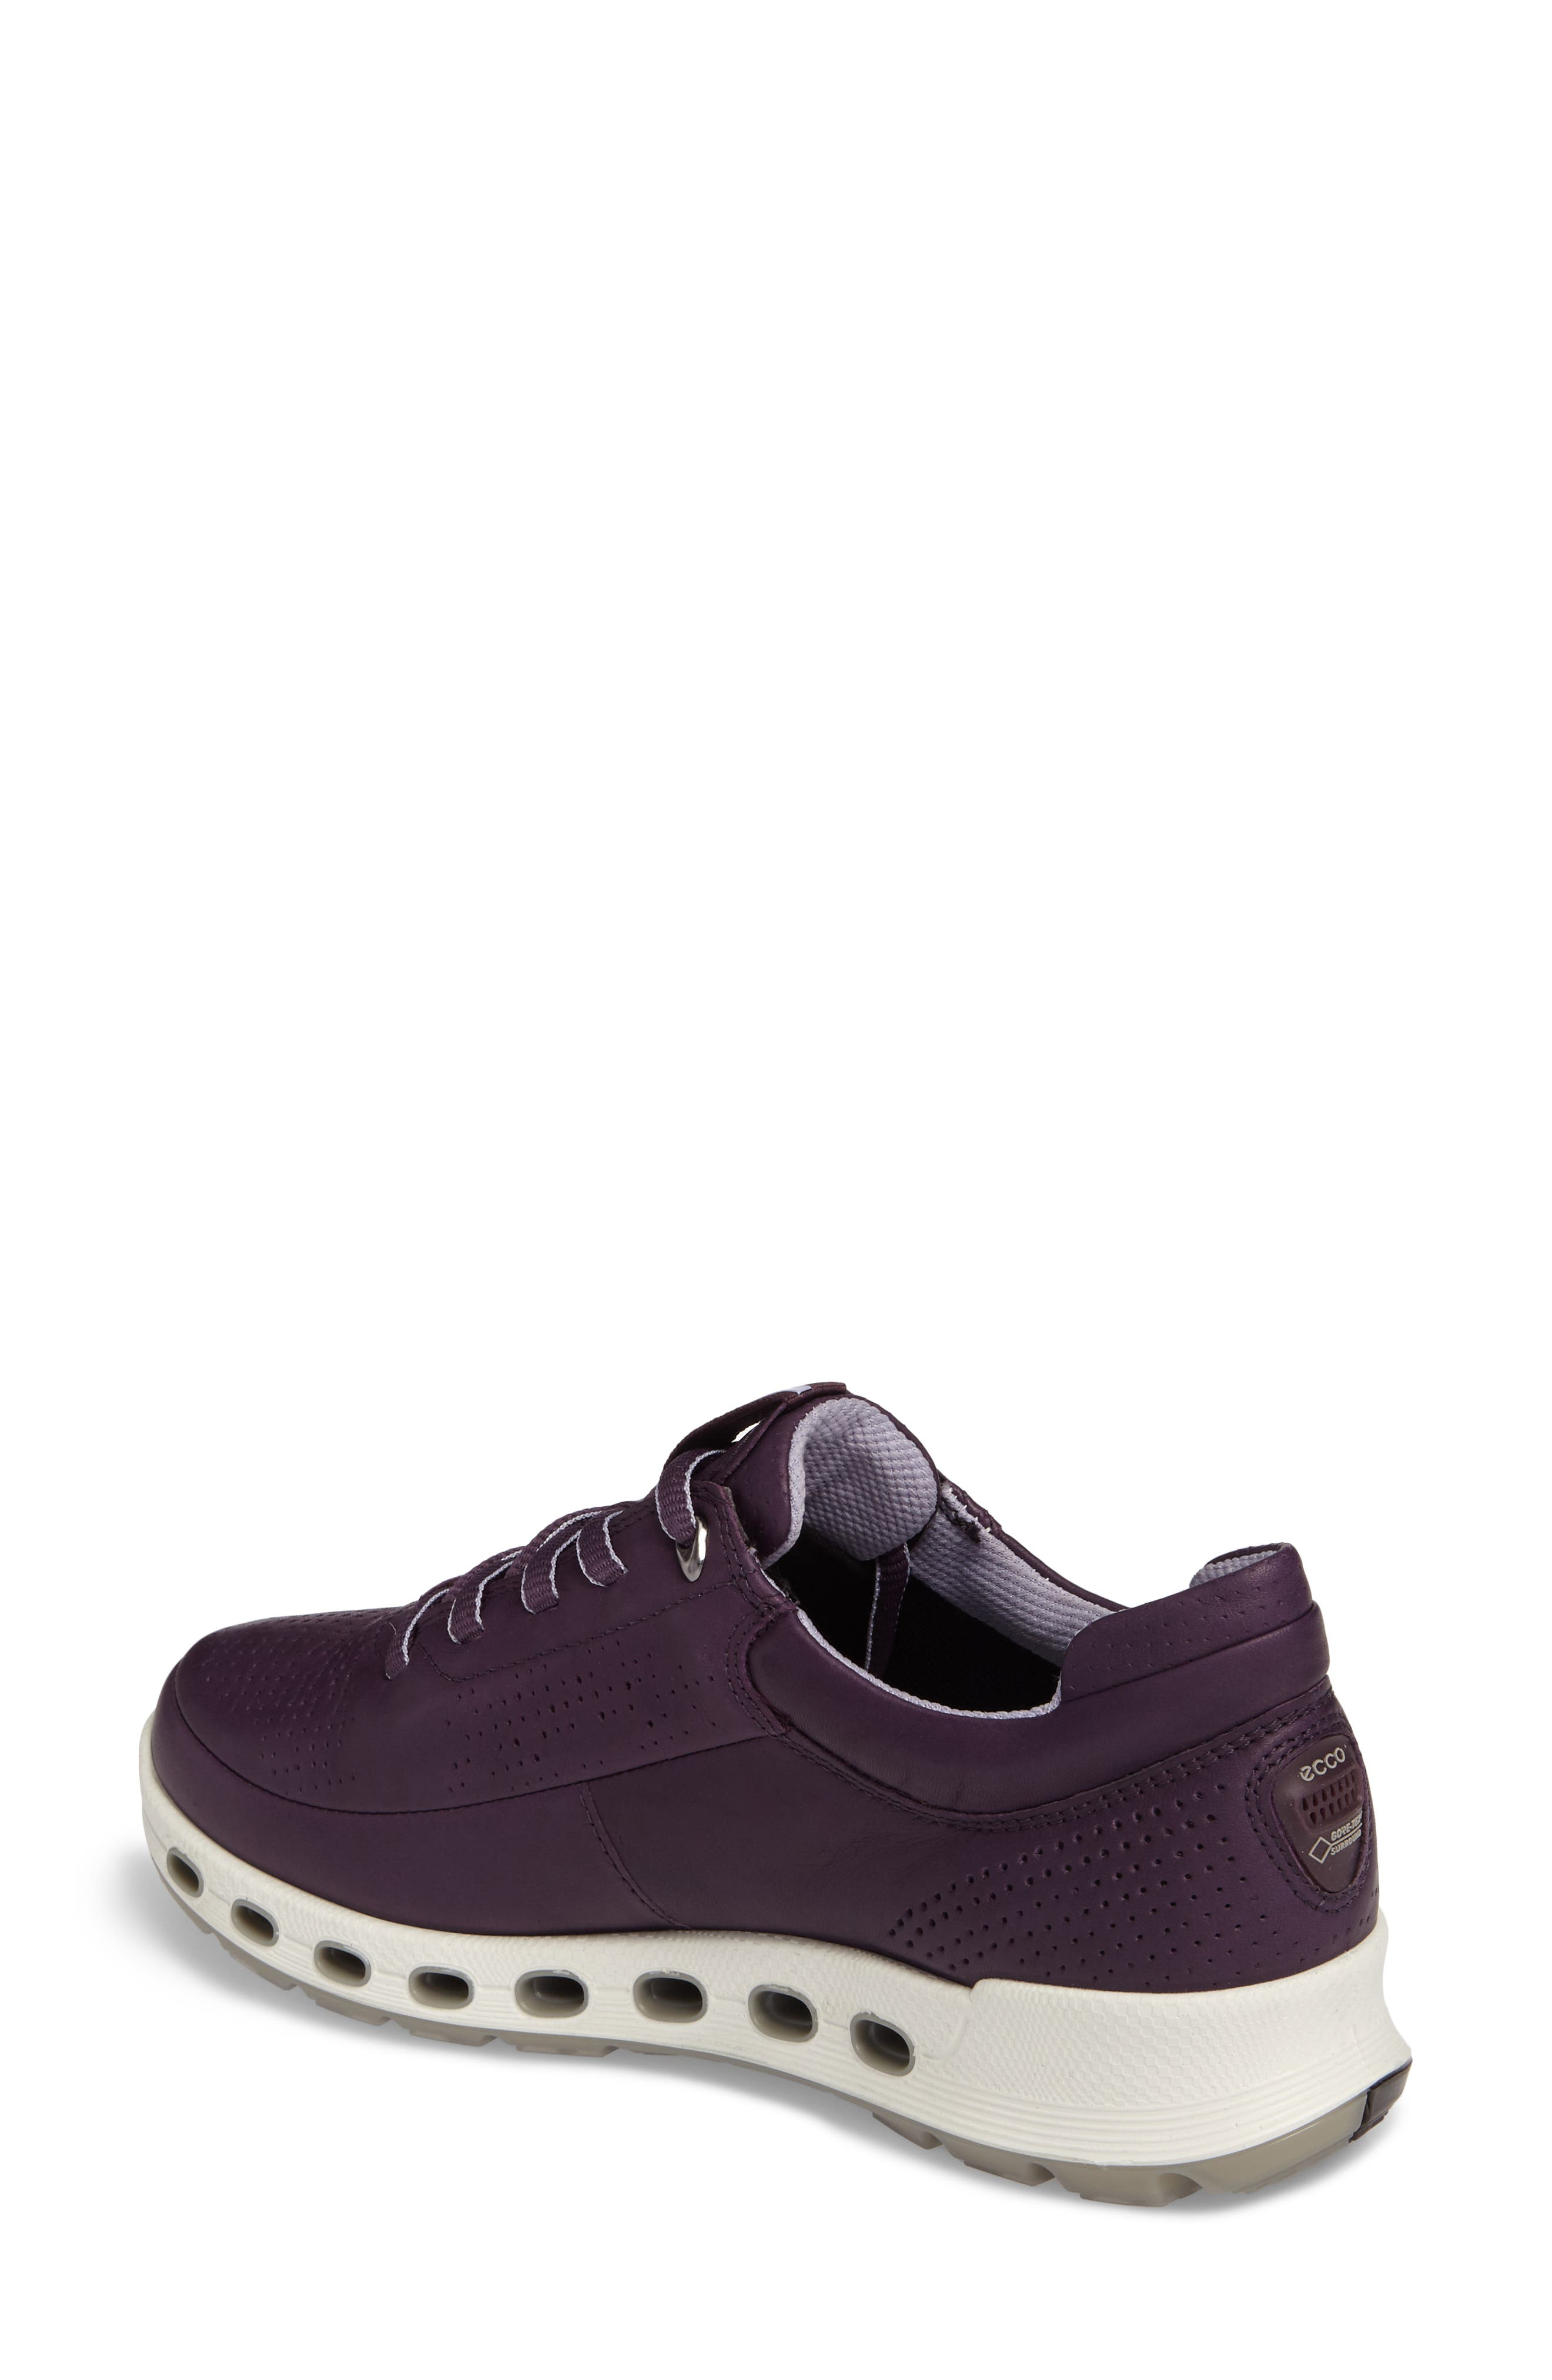 Cool 2.0 GTX Waterproof Sneaker,                             Alternate thumbnail 2, color,                             500